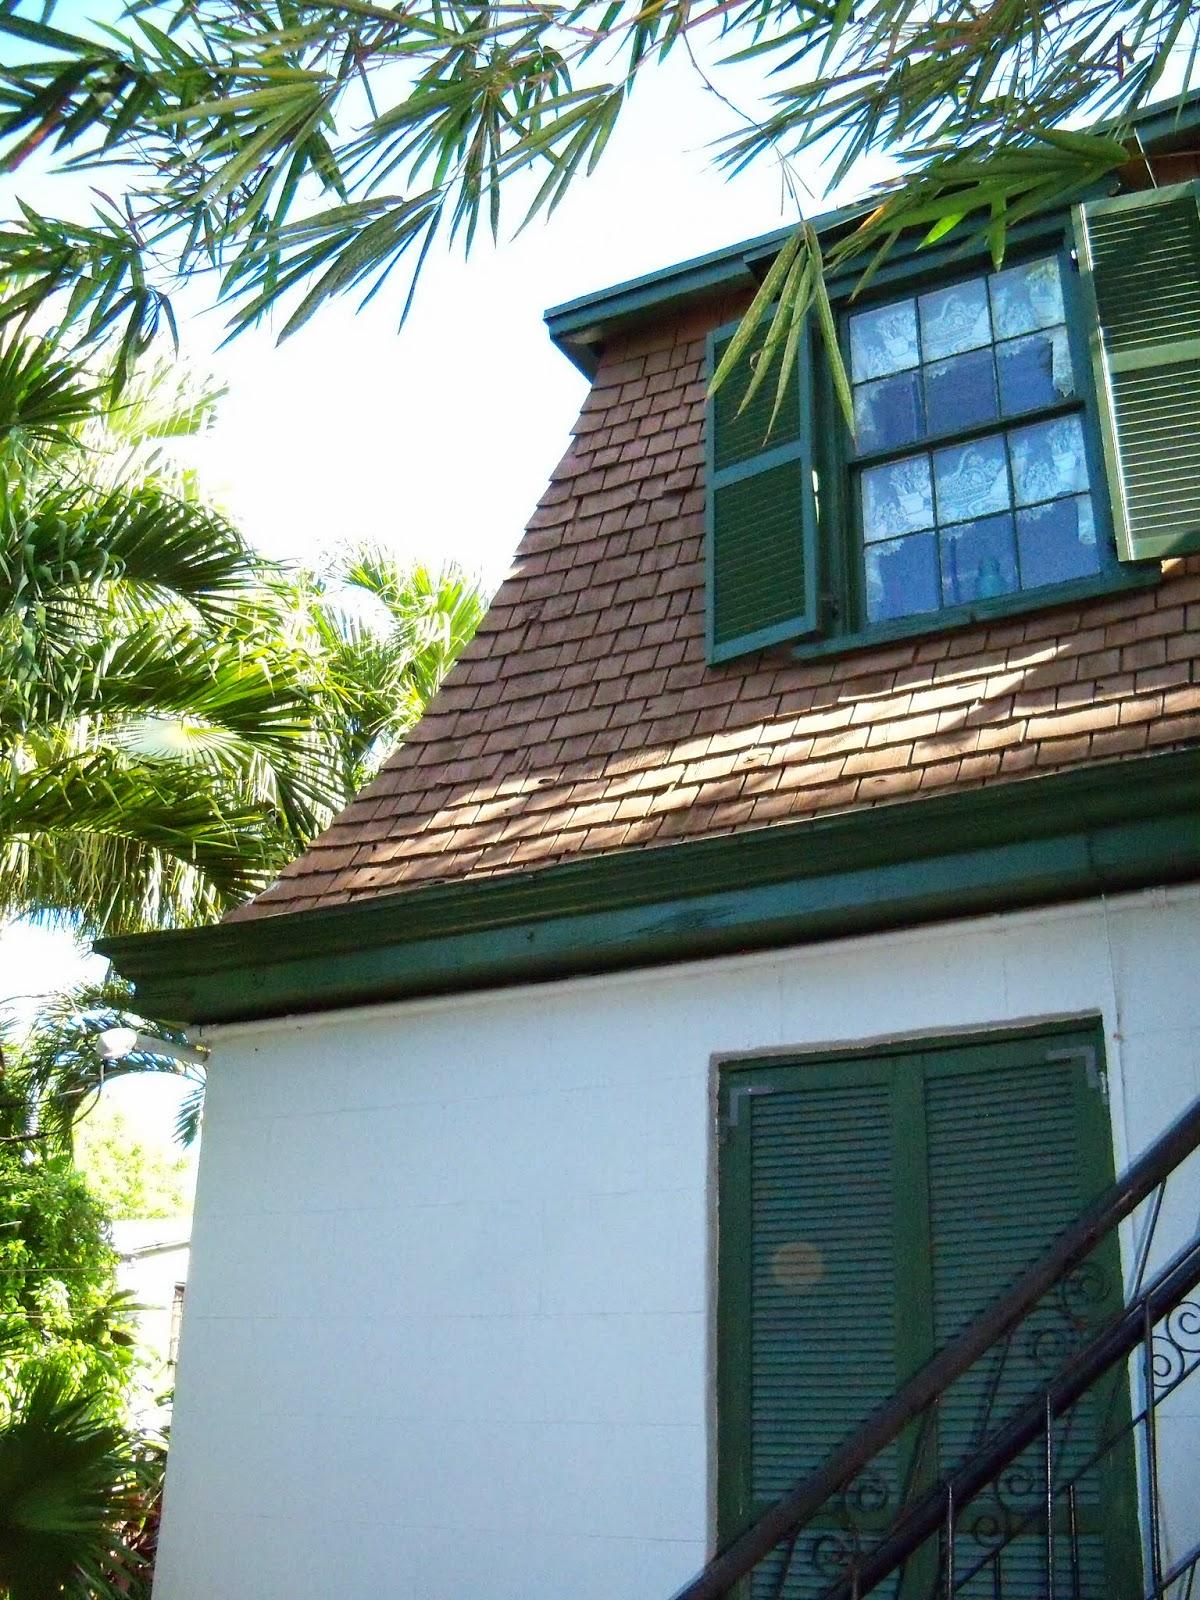 Key West Vacation - 116_5442.JPG